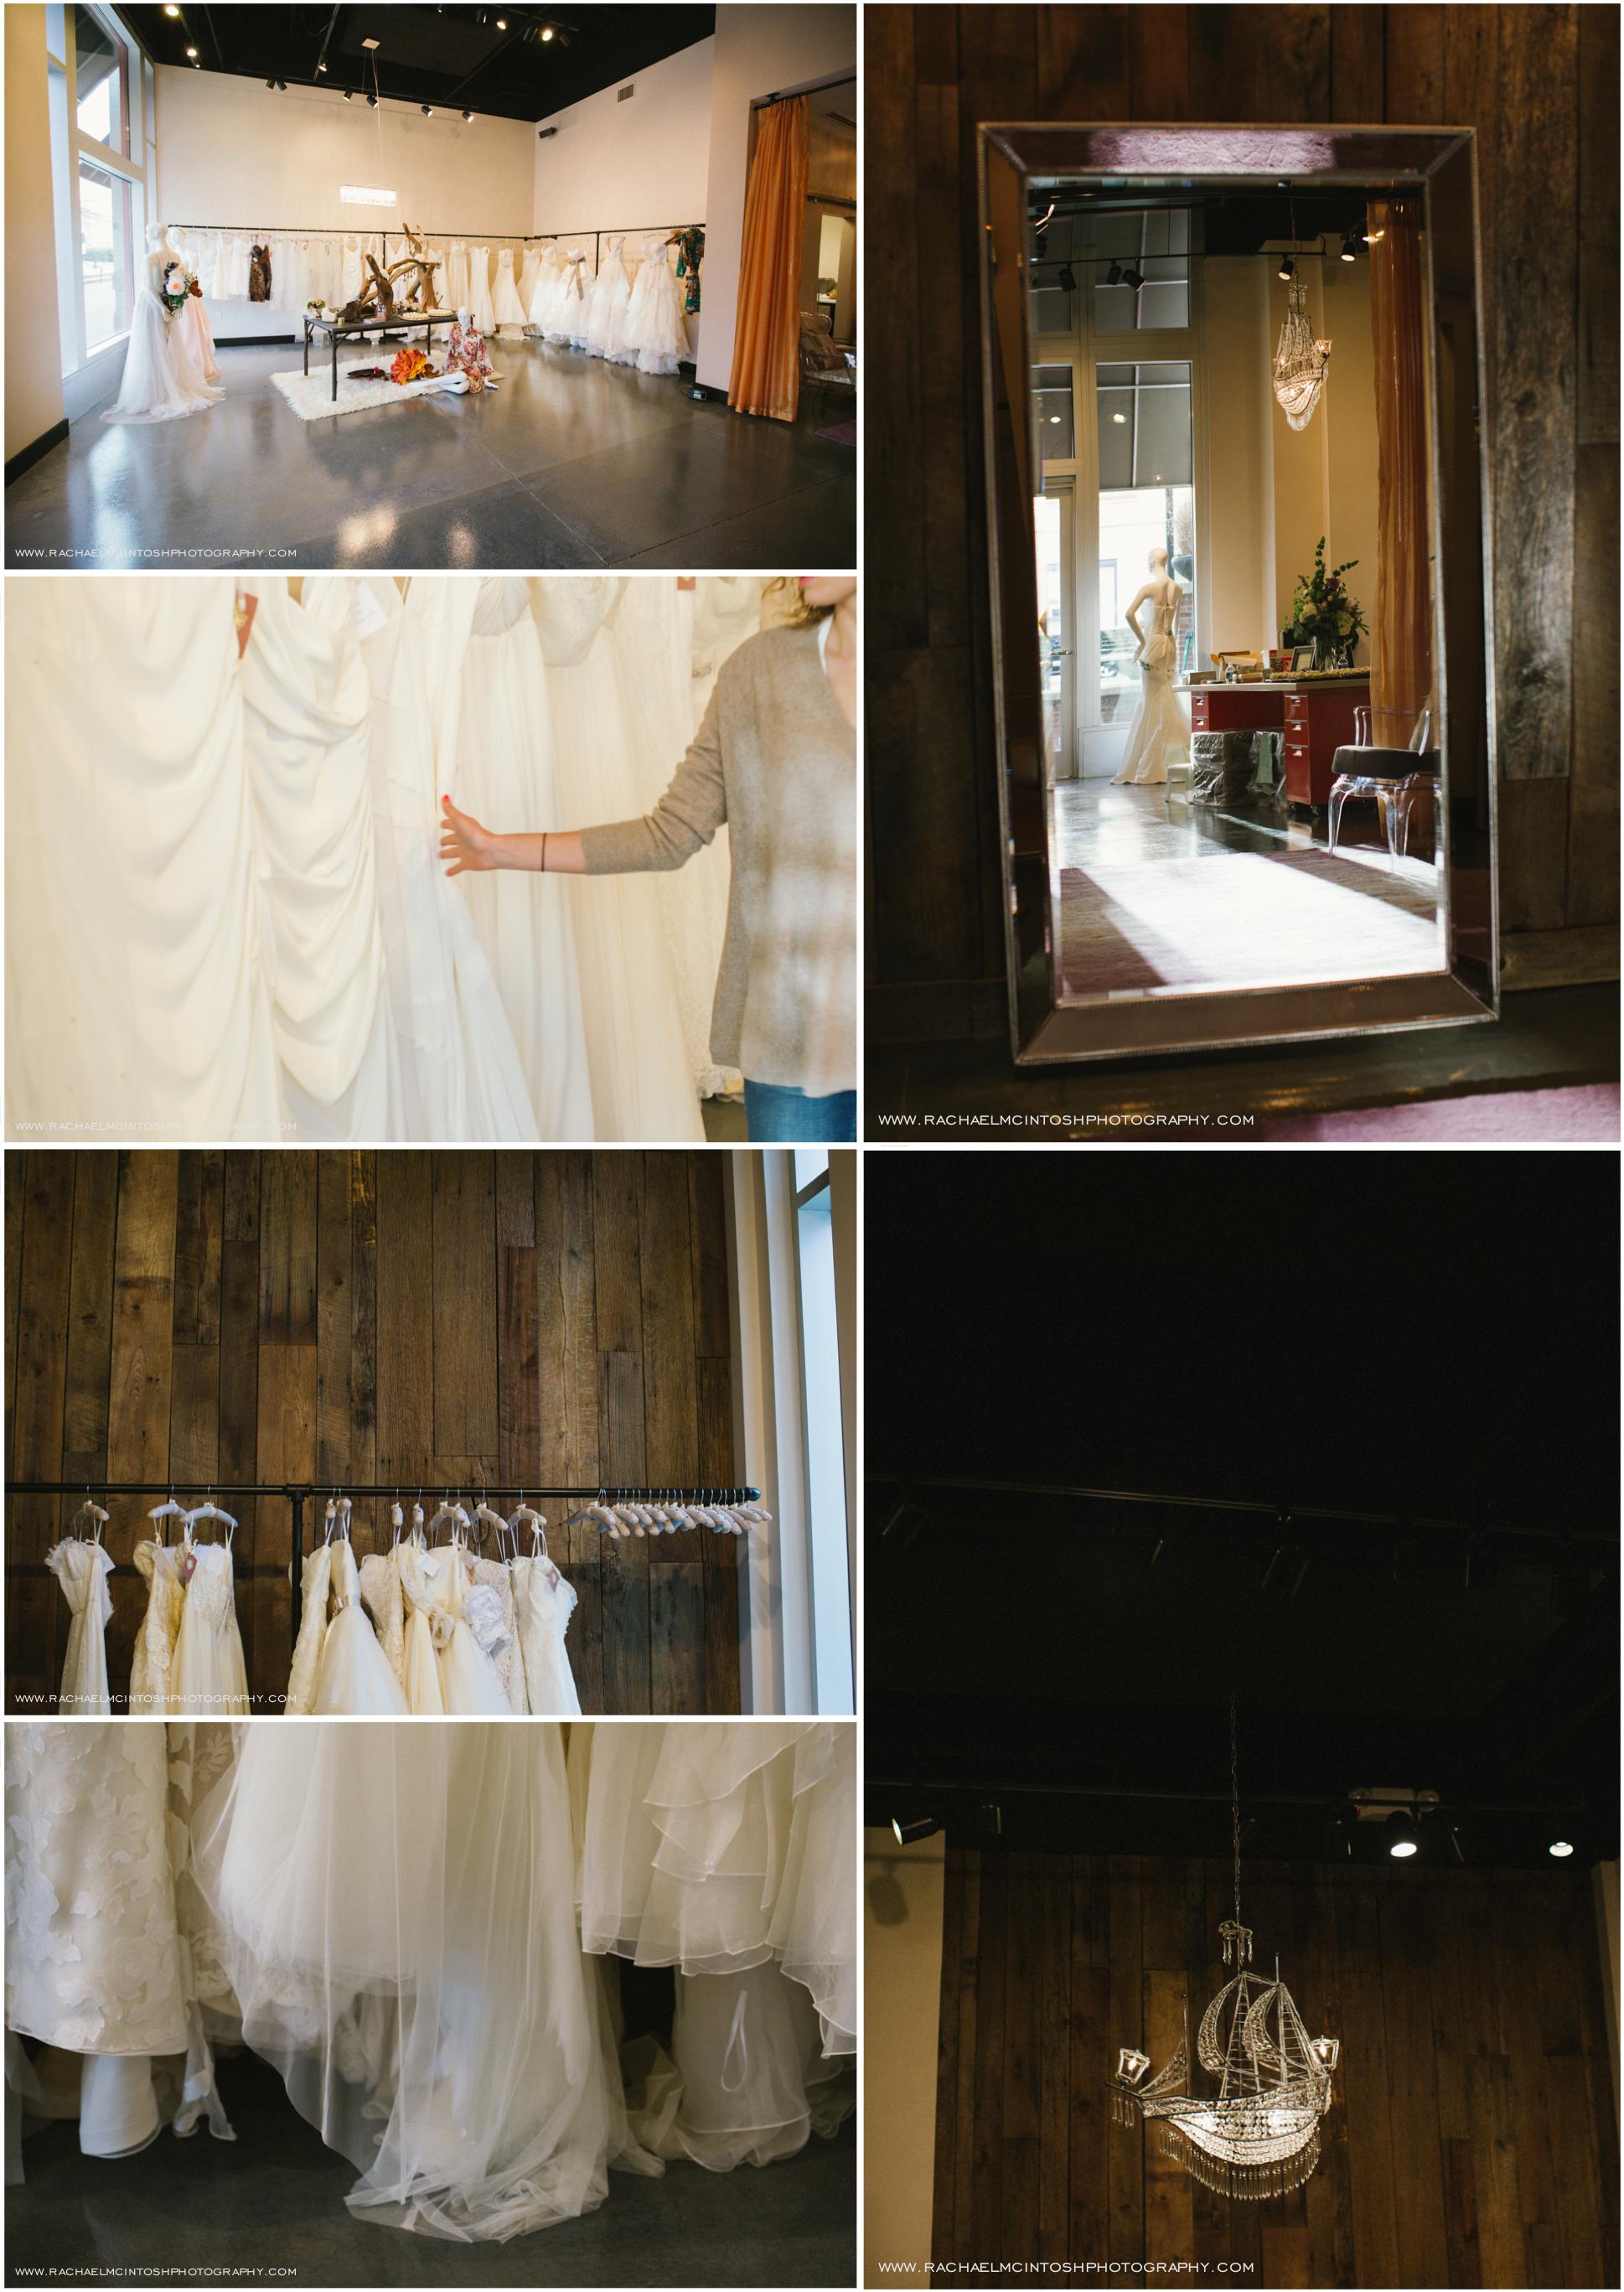 Asheville Bridal-Wildflower Bridal-Wedding Dress 2.jpg